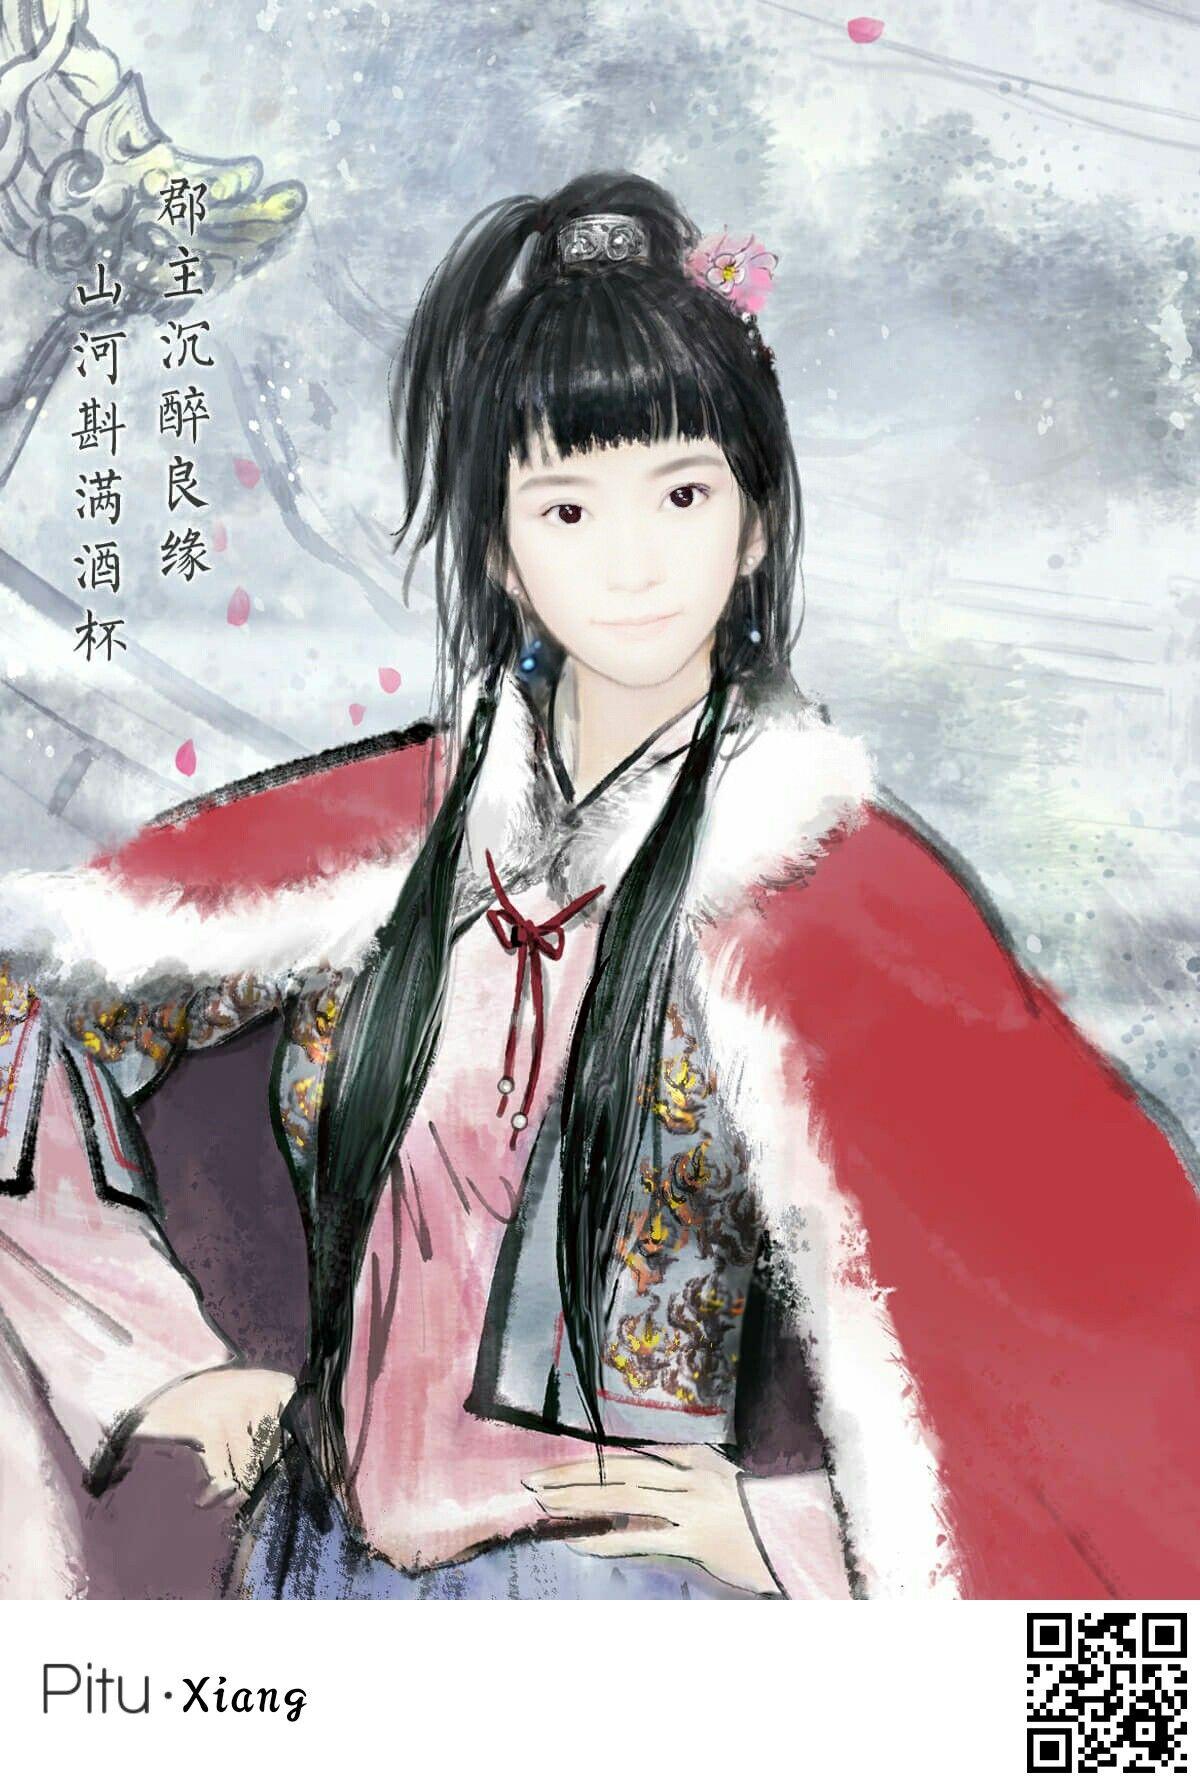 Pitu app My face Painting of girl, Art, Anime